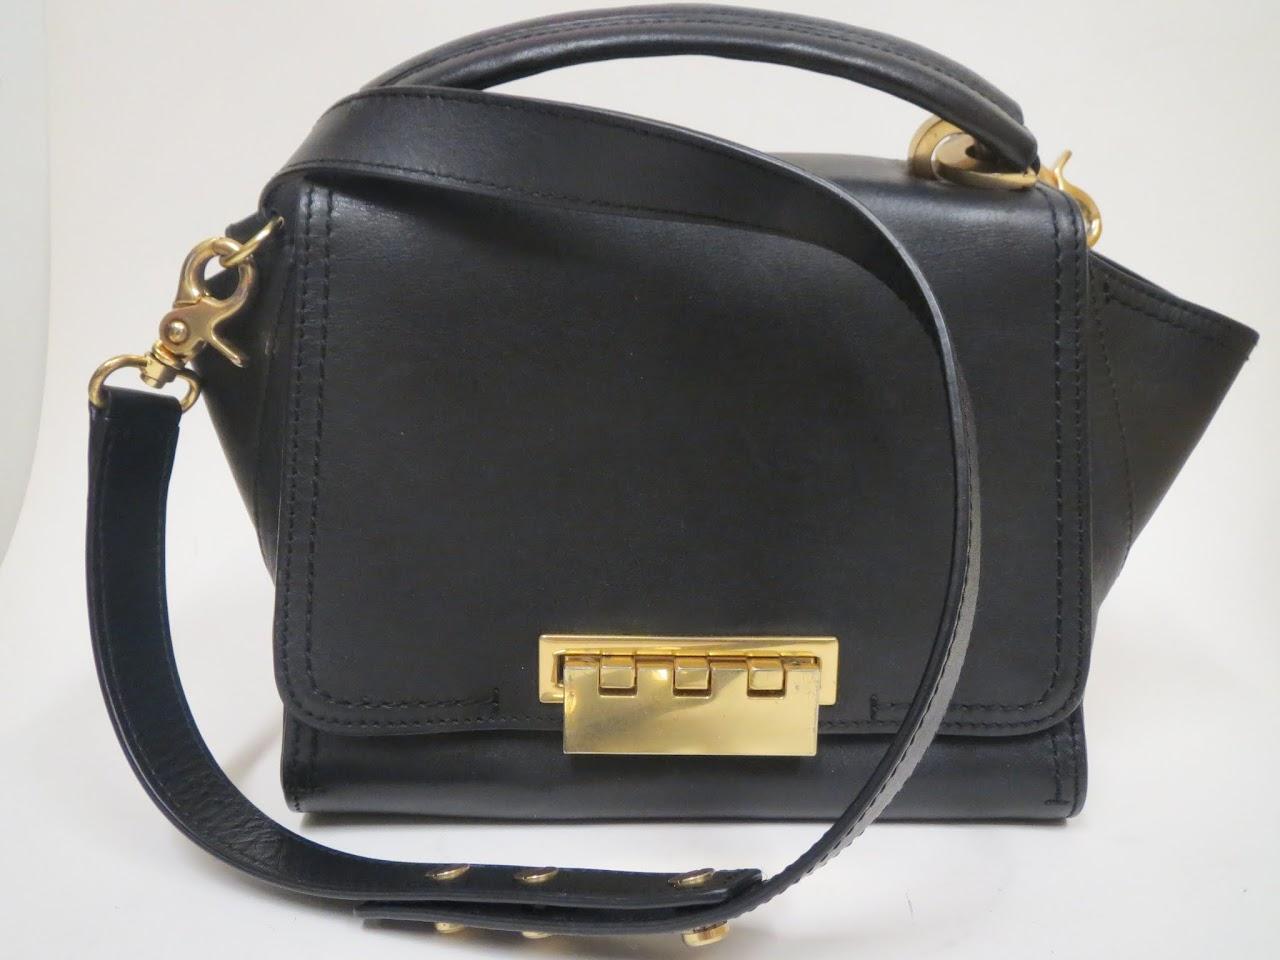 ZAC Zac Posen Eartha Extreme Soft Top Handle Bag